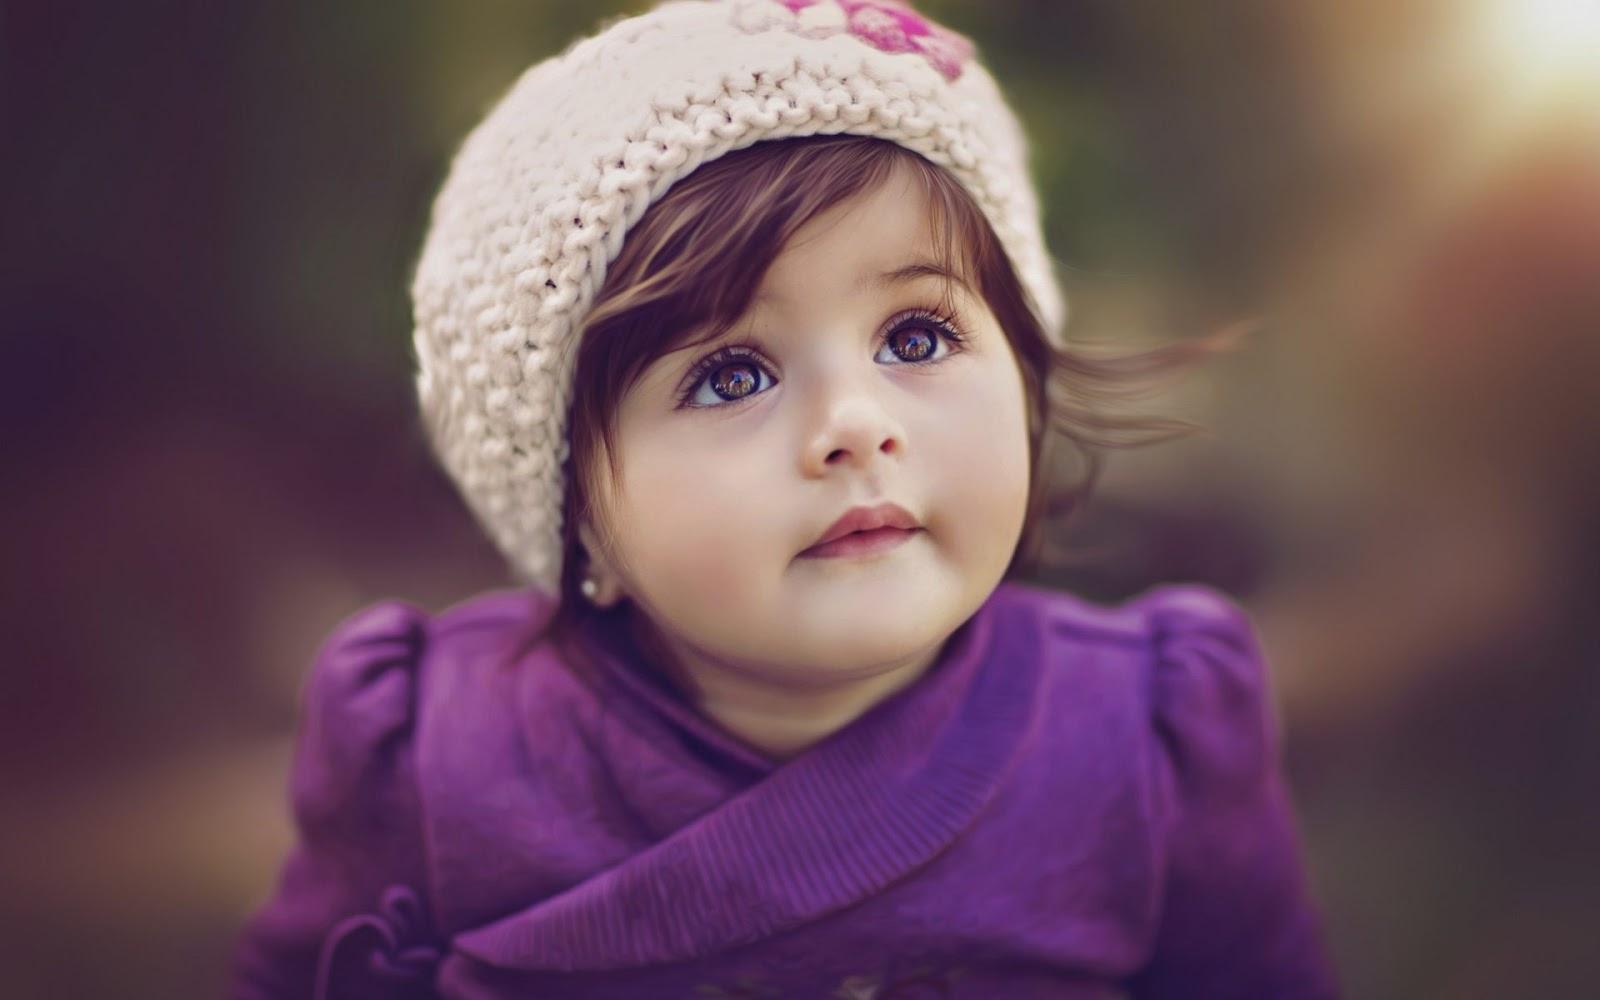 cute baby hd wallpaper ~ ultra4kwallpapers   download 4k hd